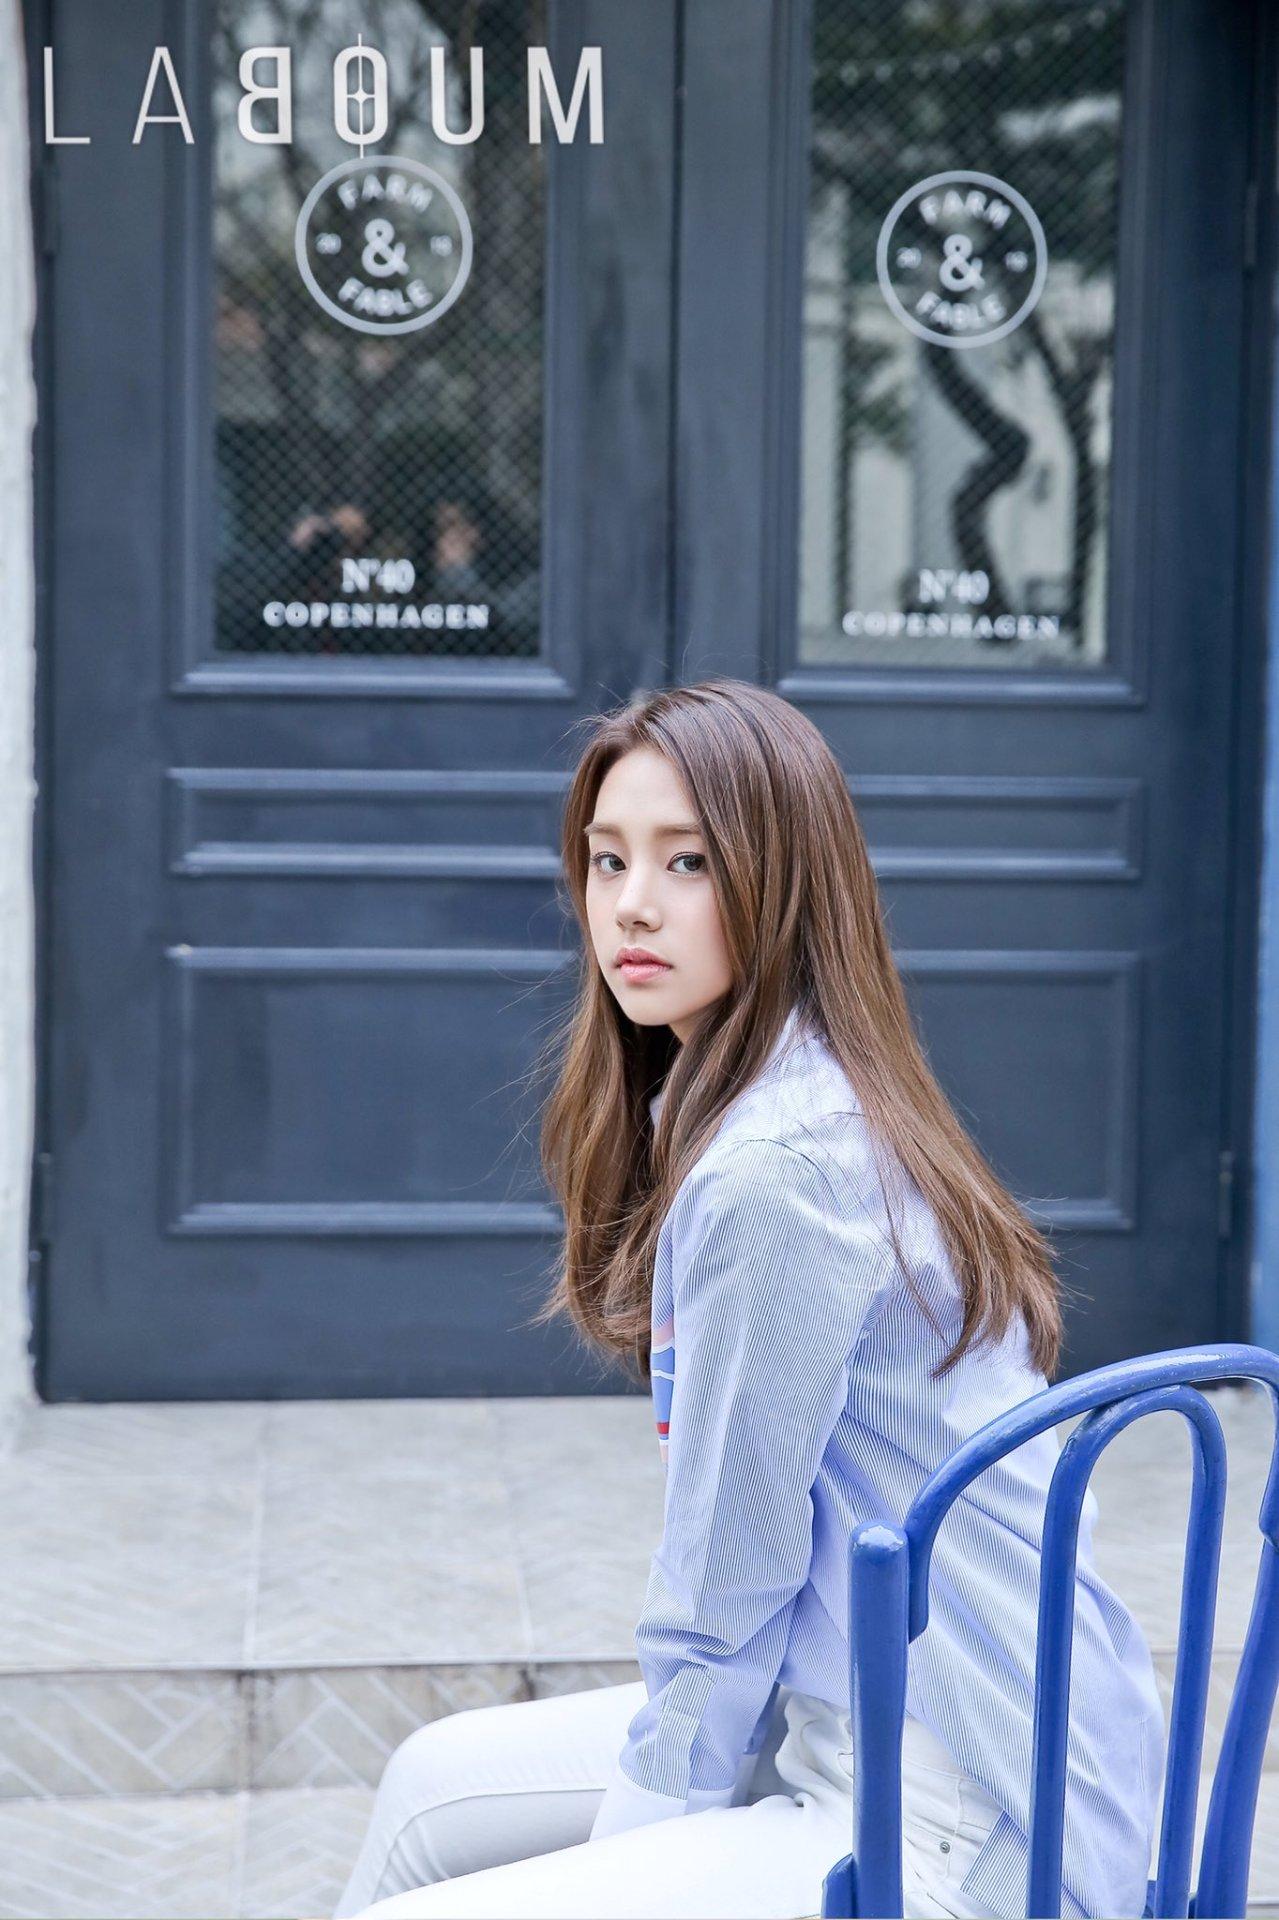 Solbin (Laboum) - Fresh Adventure - Korean photoshoots